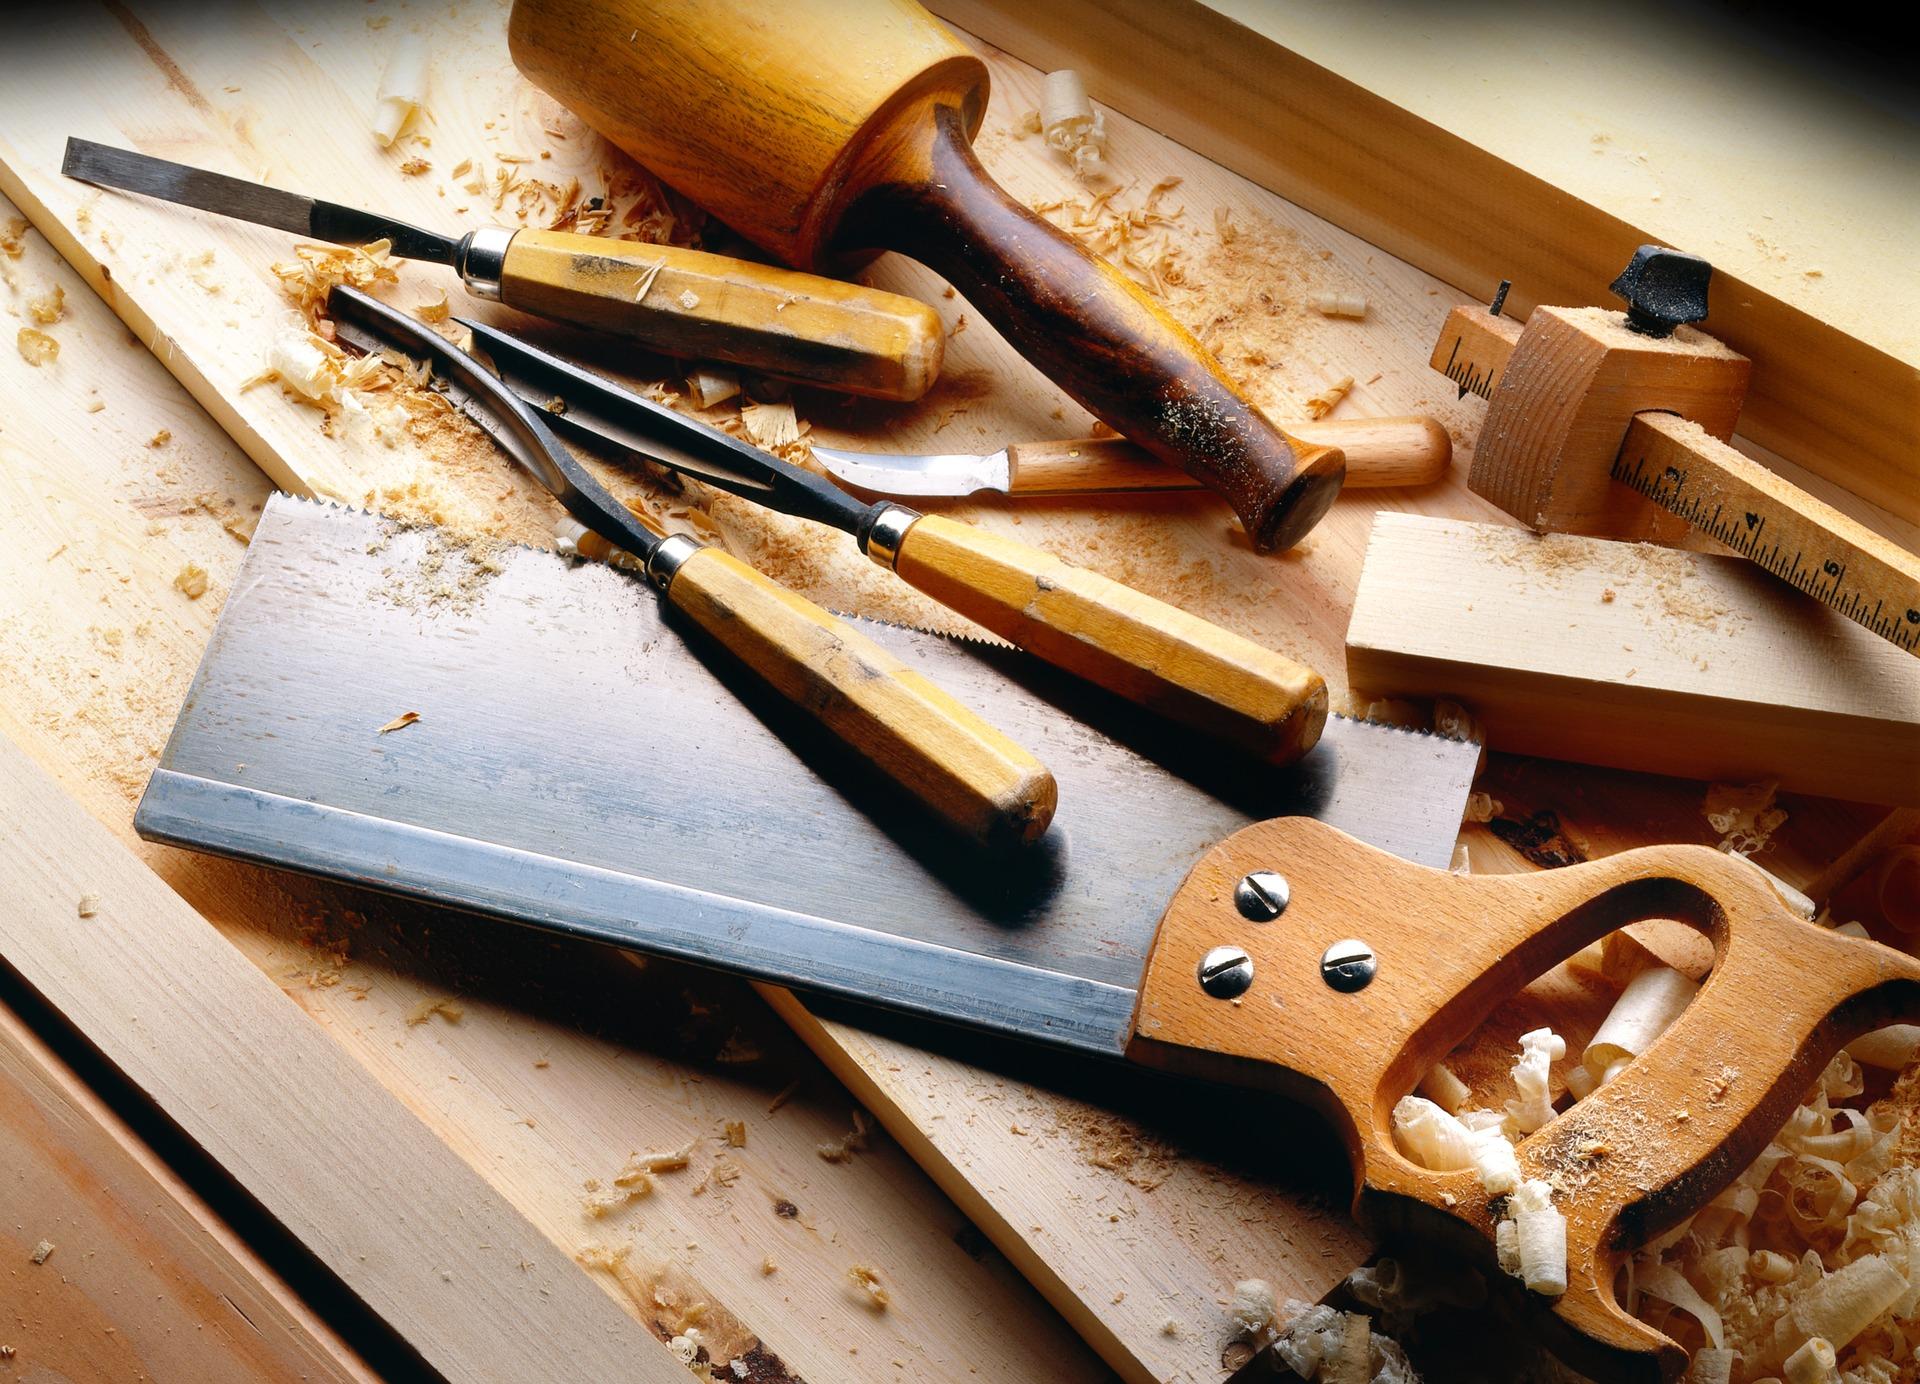 trades contractors workers compensation